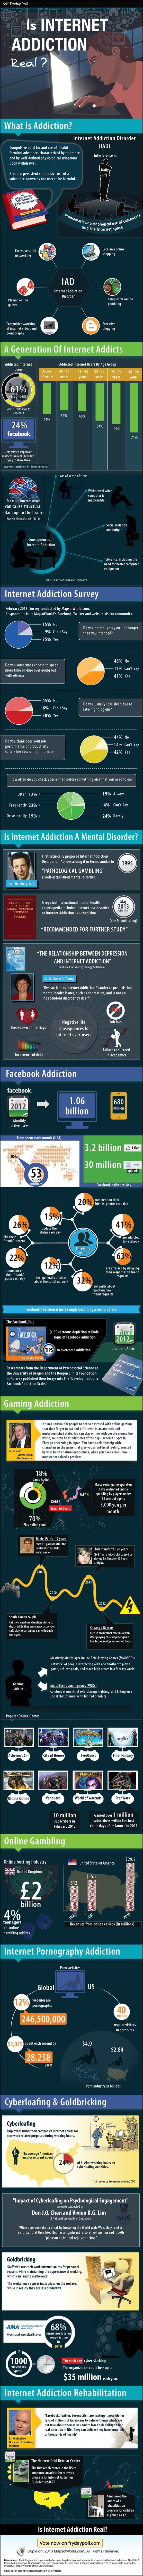 internet-addiction-study-facts-infographic